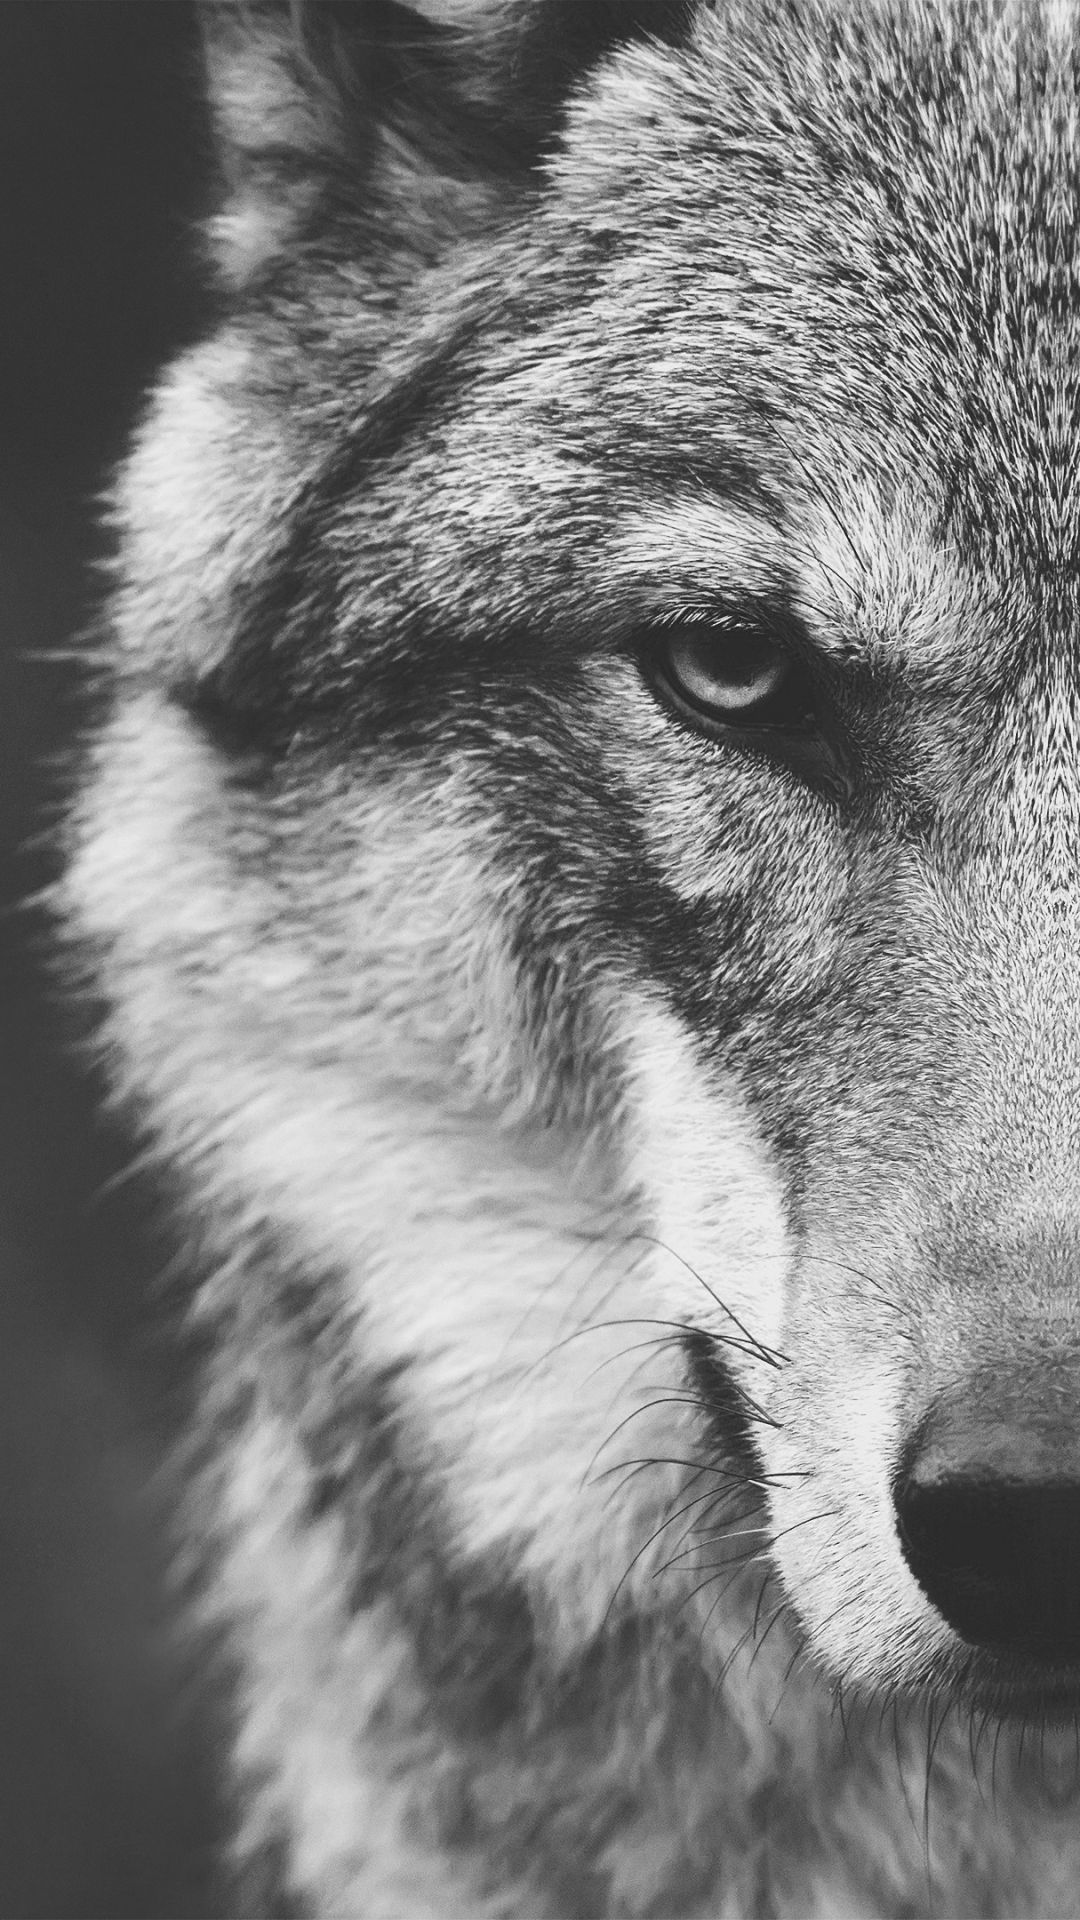 Wolf Phone Background : phone, background, Animal, (1080x1920), Mobile, Wallpaper, ไซบีเรียนฮัสกี,, ไซบีเรียน, ฮัสกี้,, หมาป่าเดียวดาย